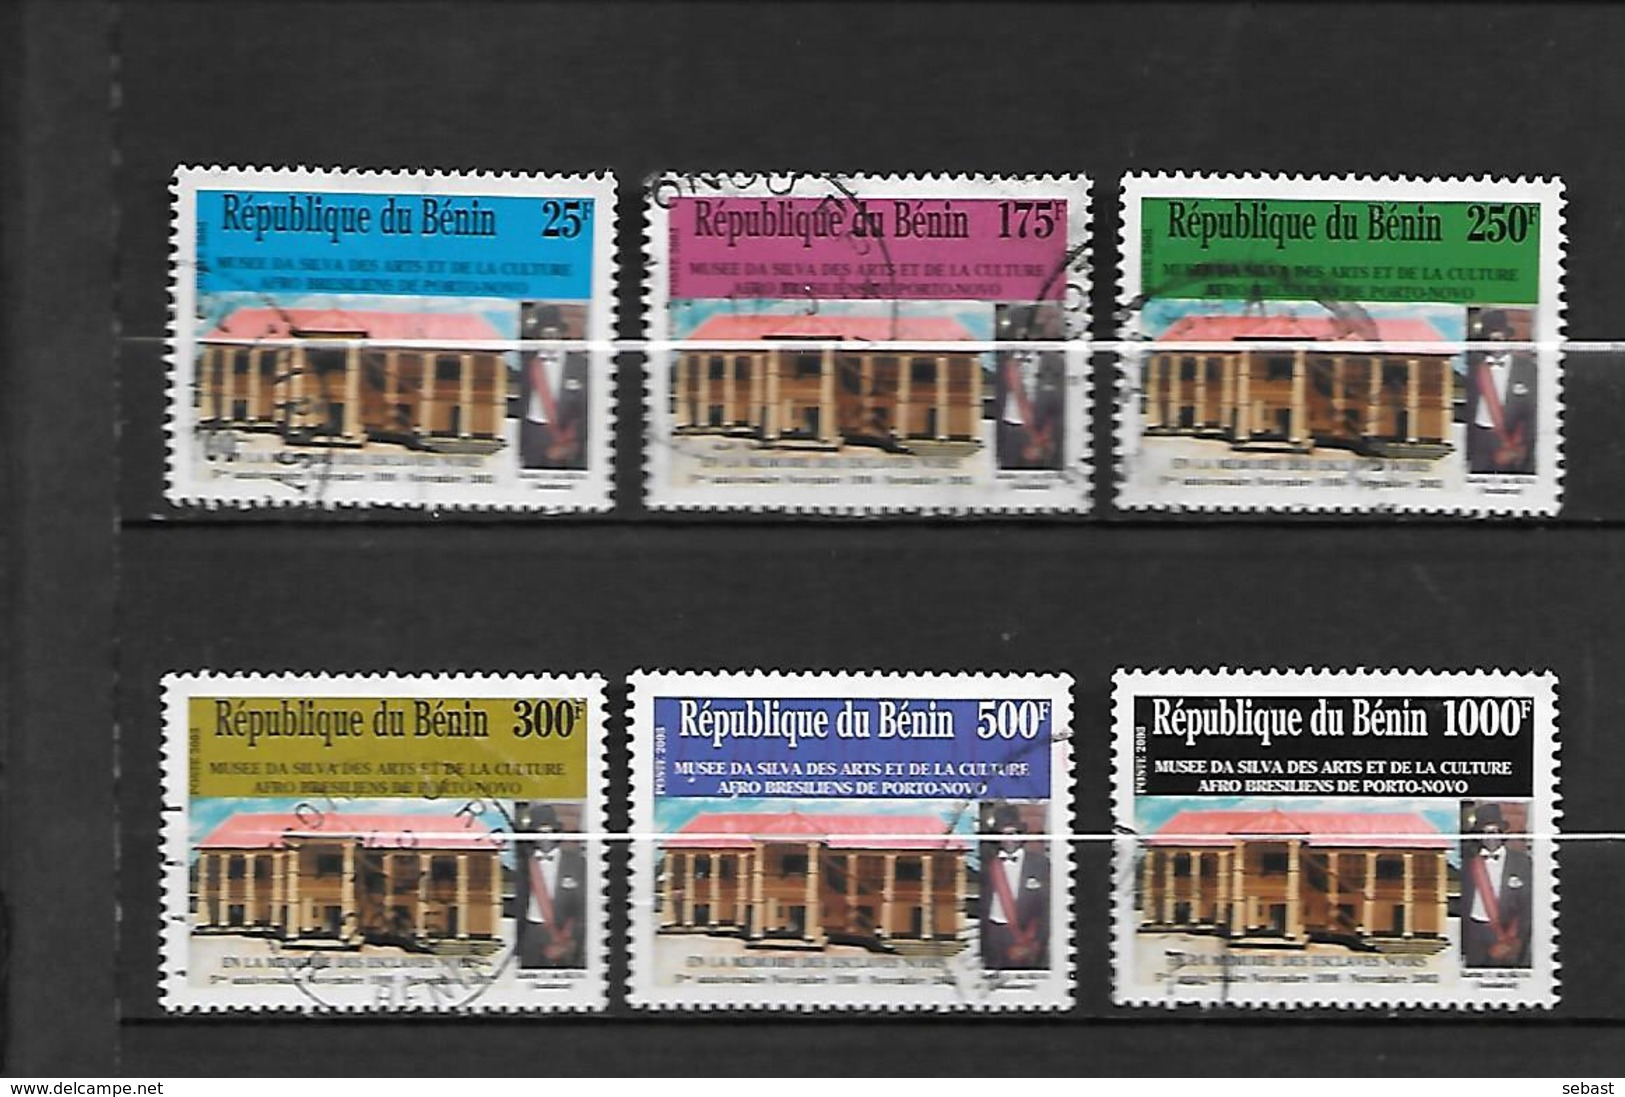 TIMBRES OBLITERES DU BENIN   DE 2003 N° MICHEL 1350/55 - Bénin – Dahomey (1960-...)